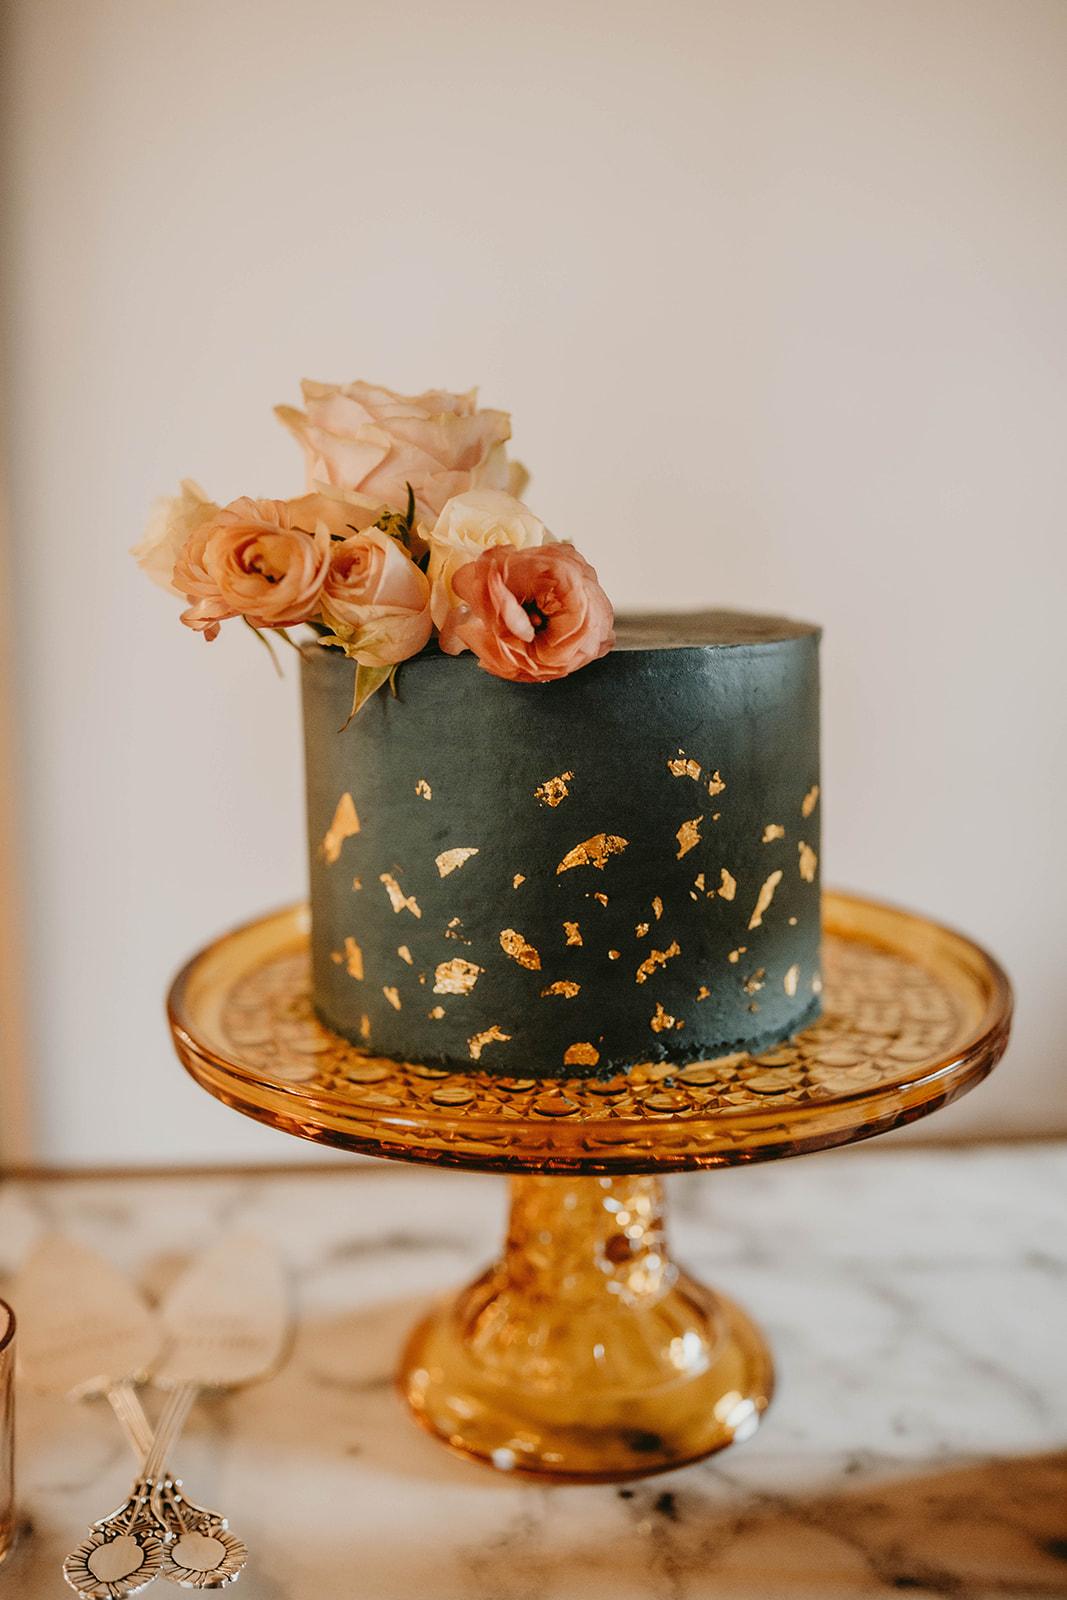 wedding cake, oregon wedding cake, portland wedding cake, simple cutting cake, cake flowers, oregon florist, portland florist, portland wedding flowers, portland wedding florist